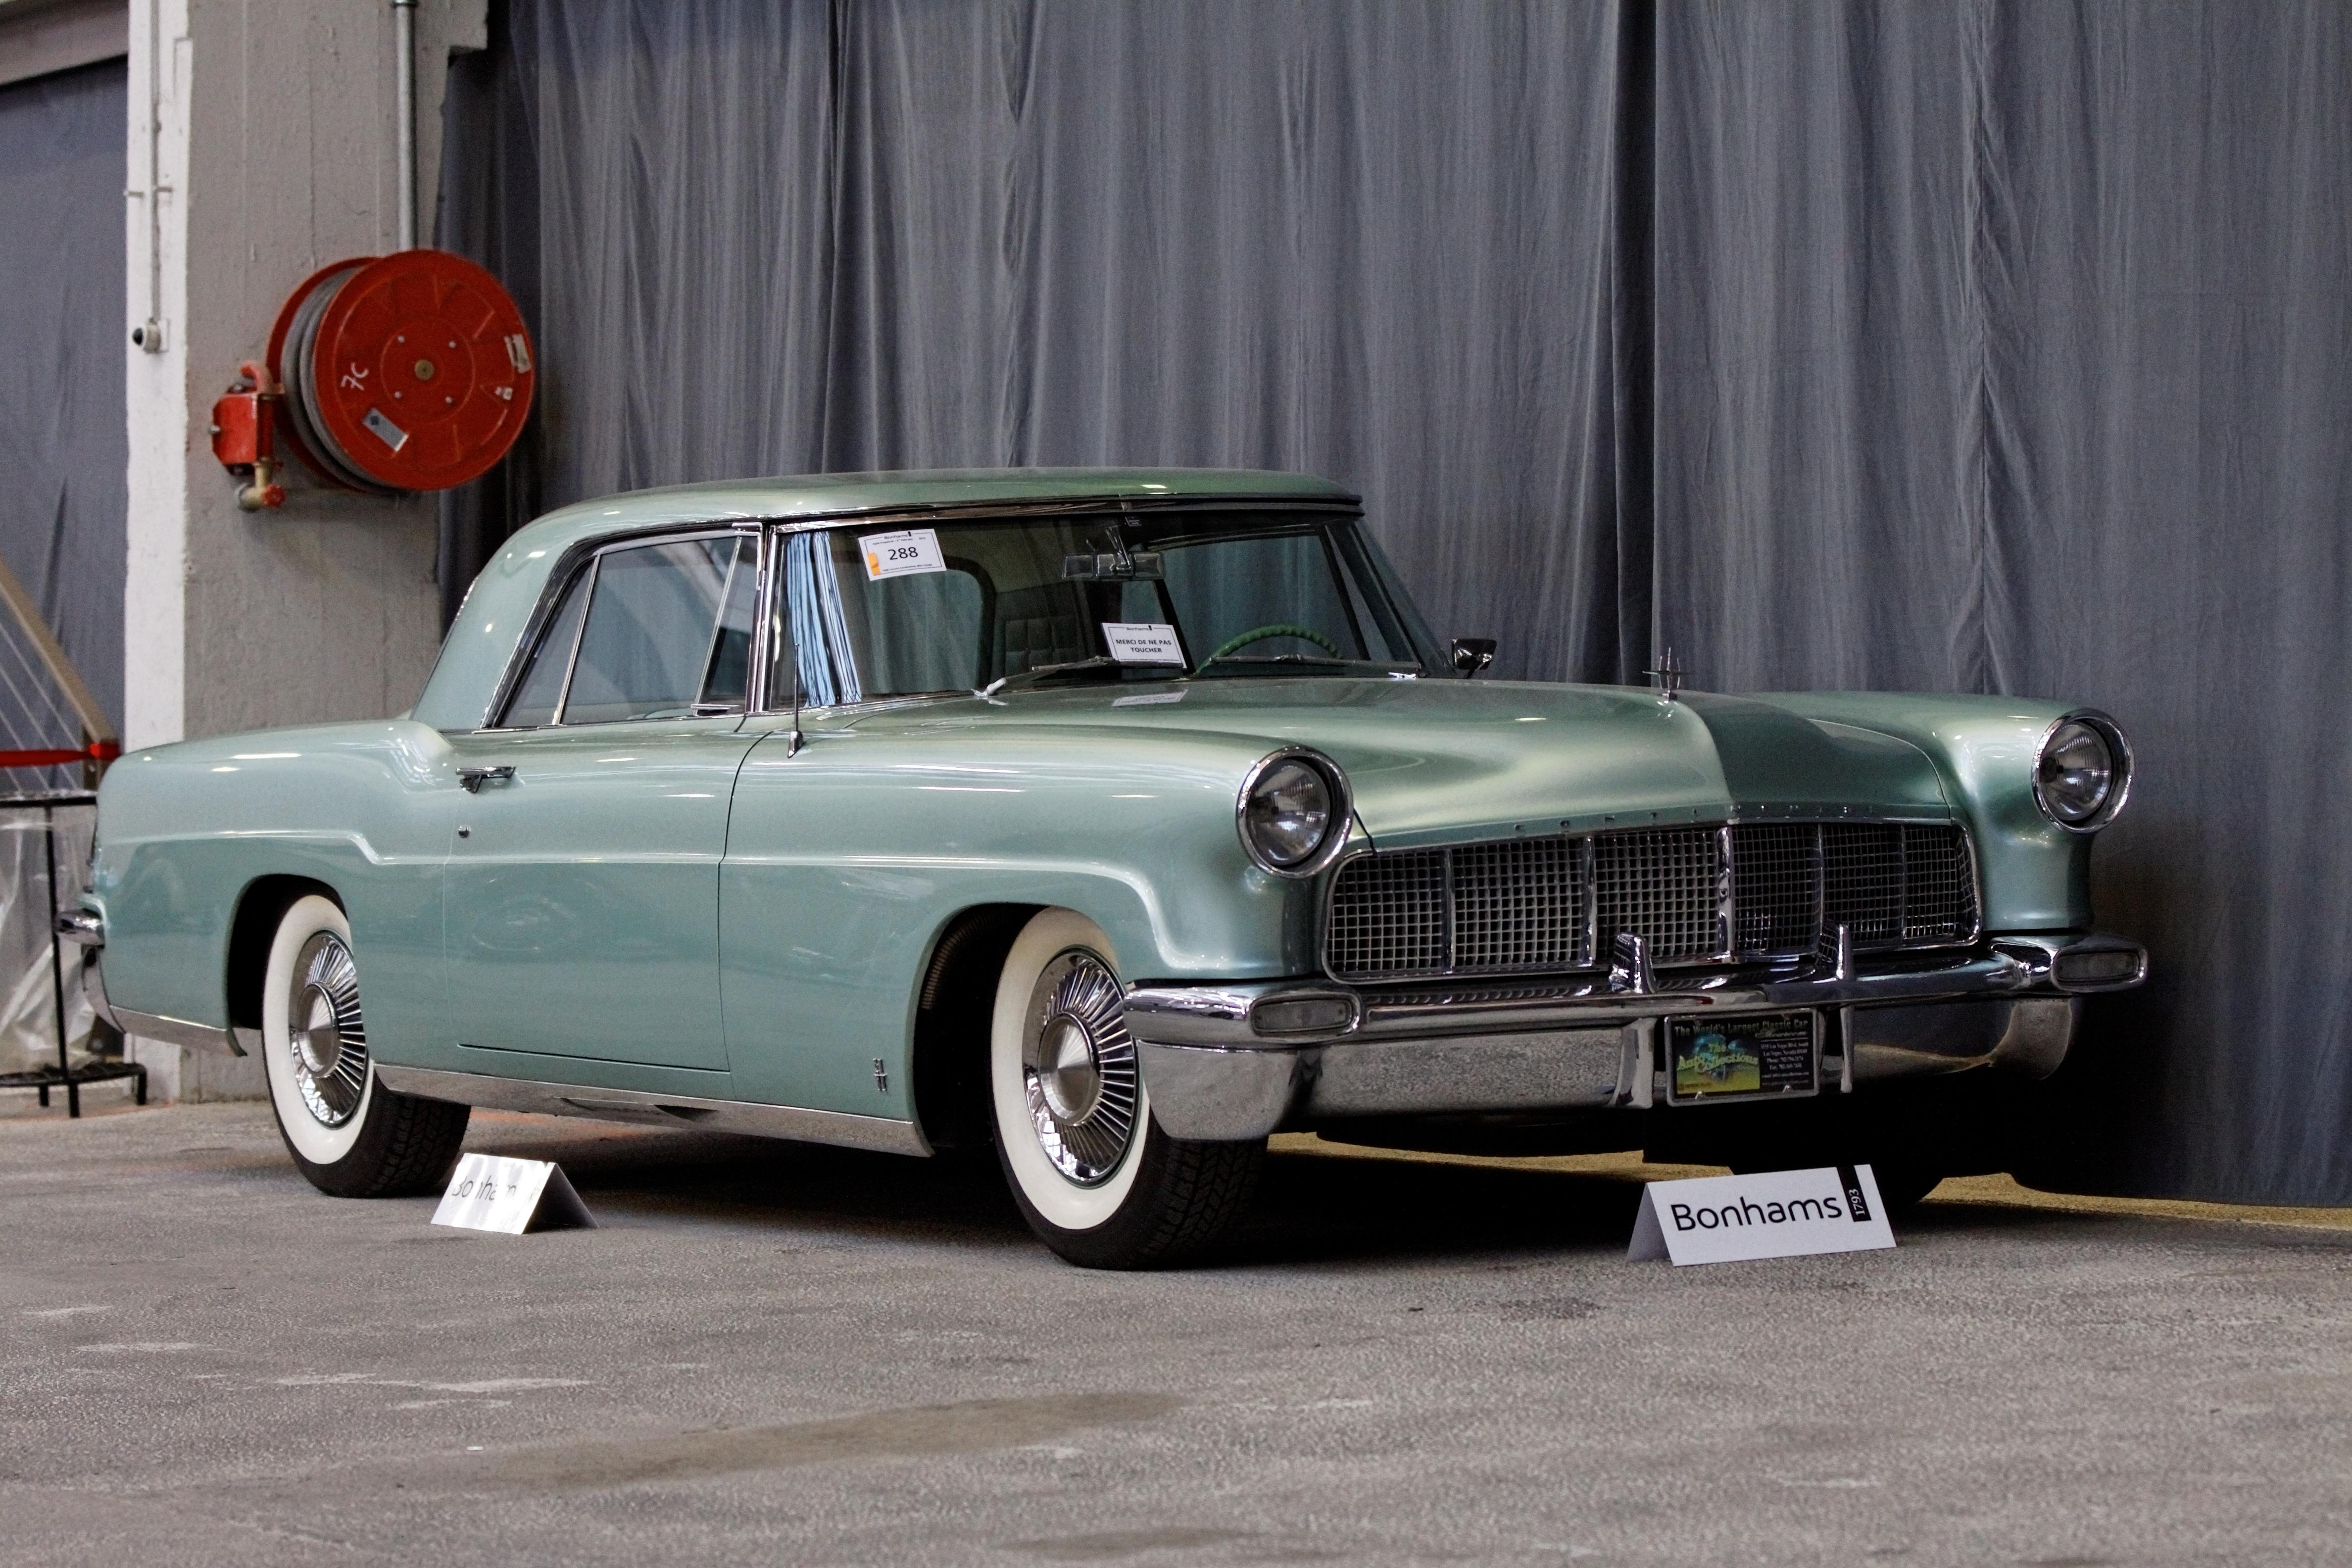 File:Bonhams - The Paris Sale 2012 - Lincoln Continental MkII Coupe